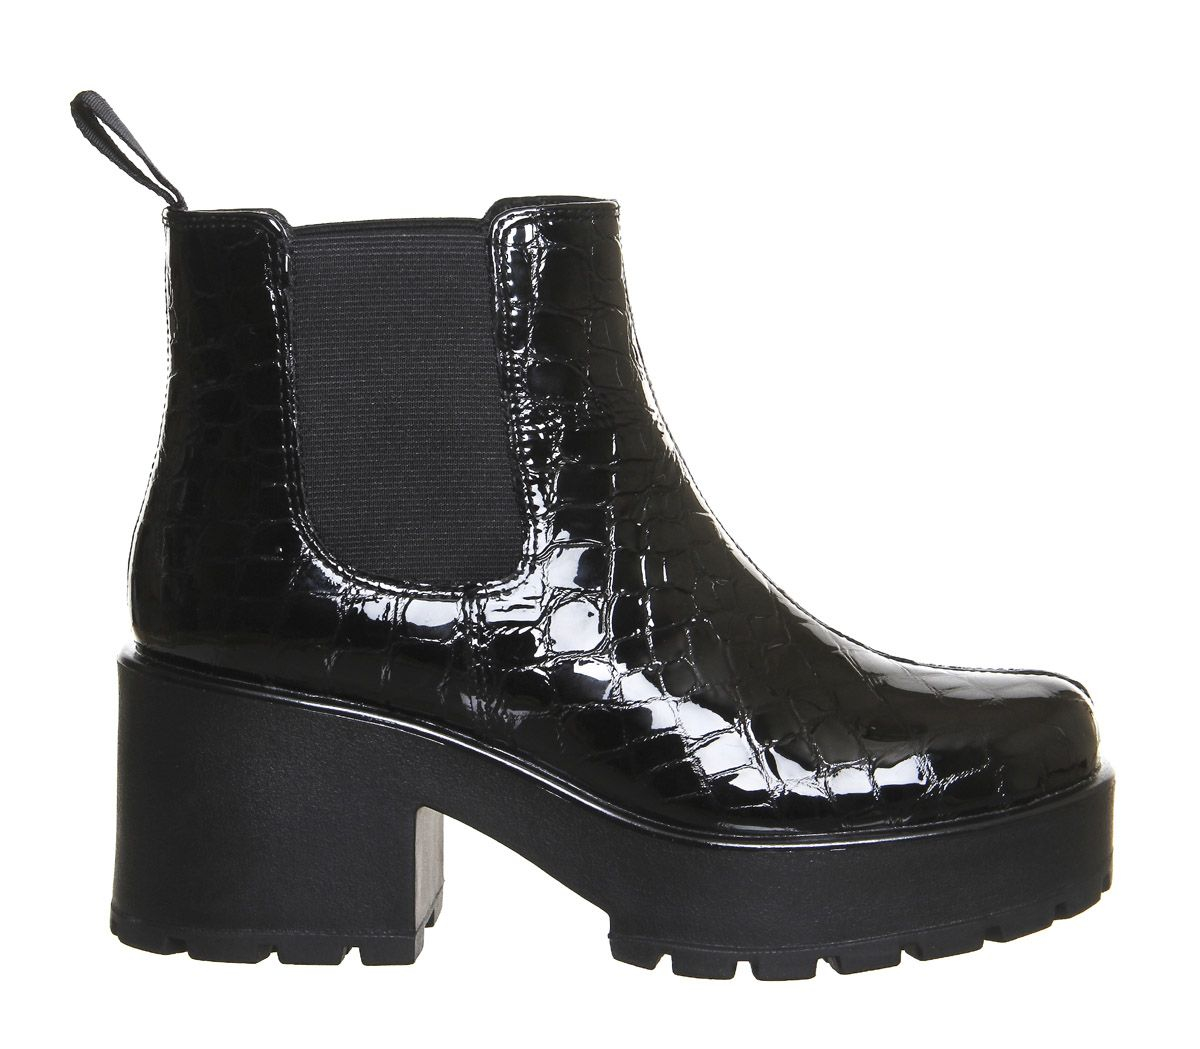 vagabond amina black leather chelsea ankle boots in black. Black Bedroom Furniture Sets. Home Design Ideas